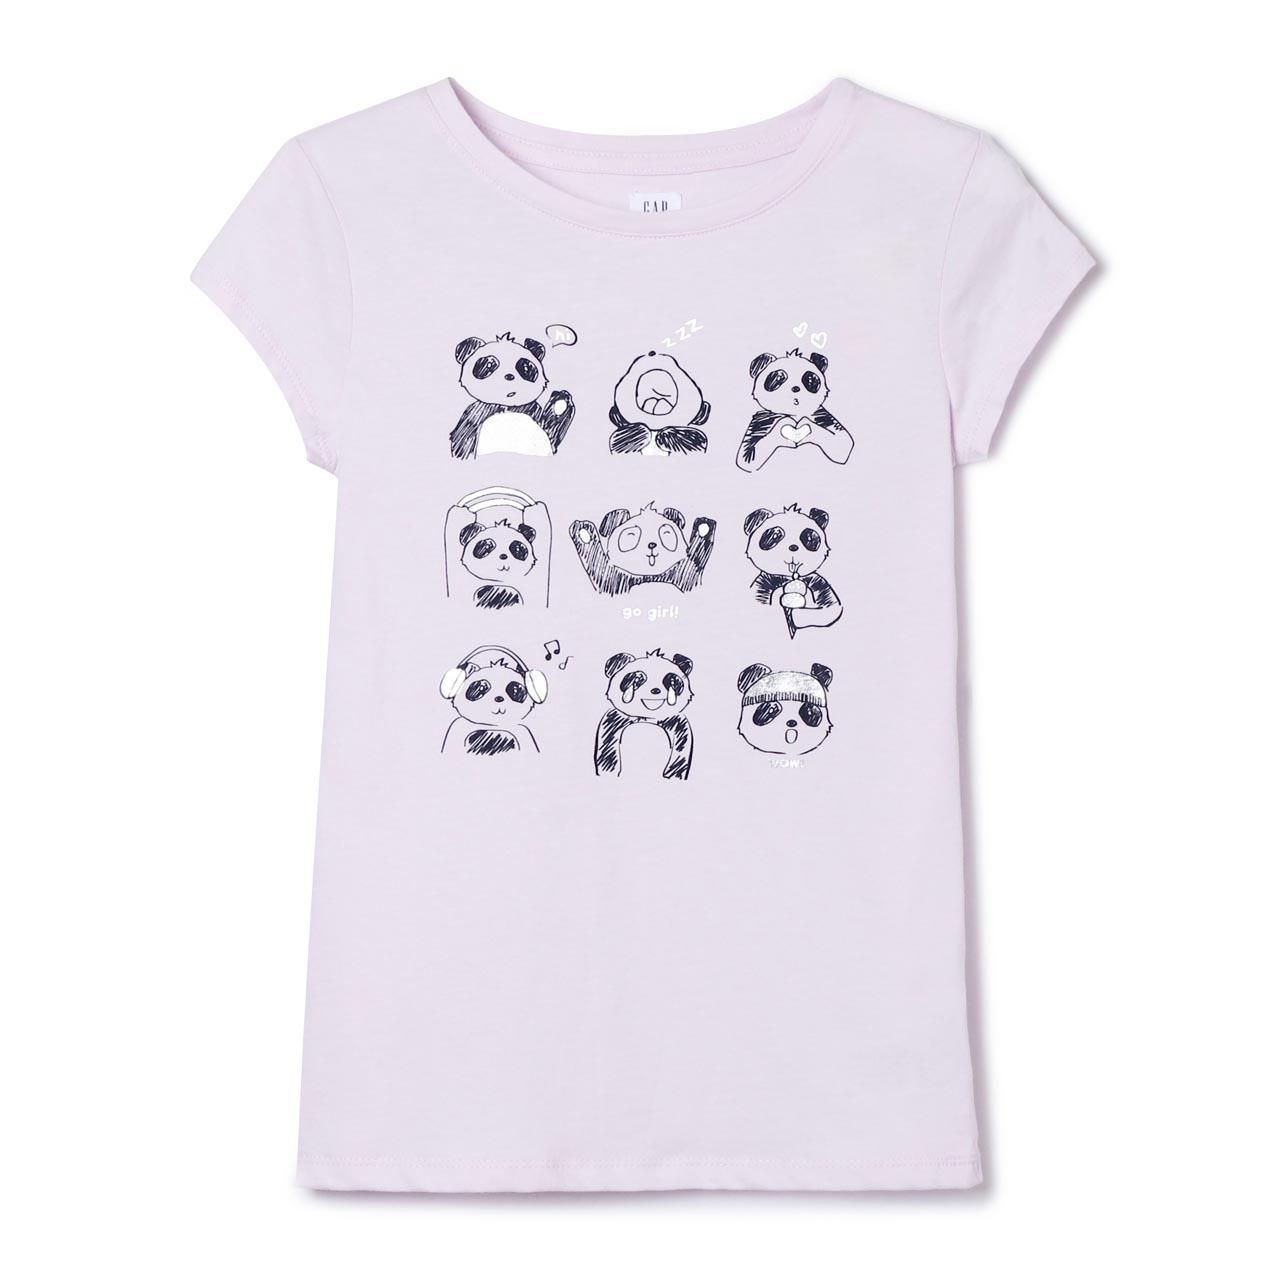 GAP 盖璞 336807 女童短袖T恤